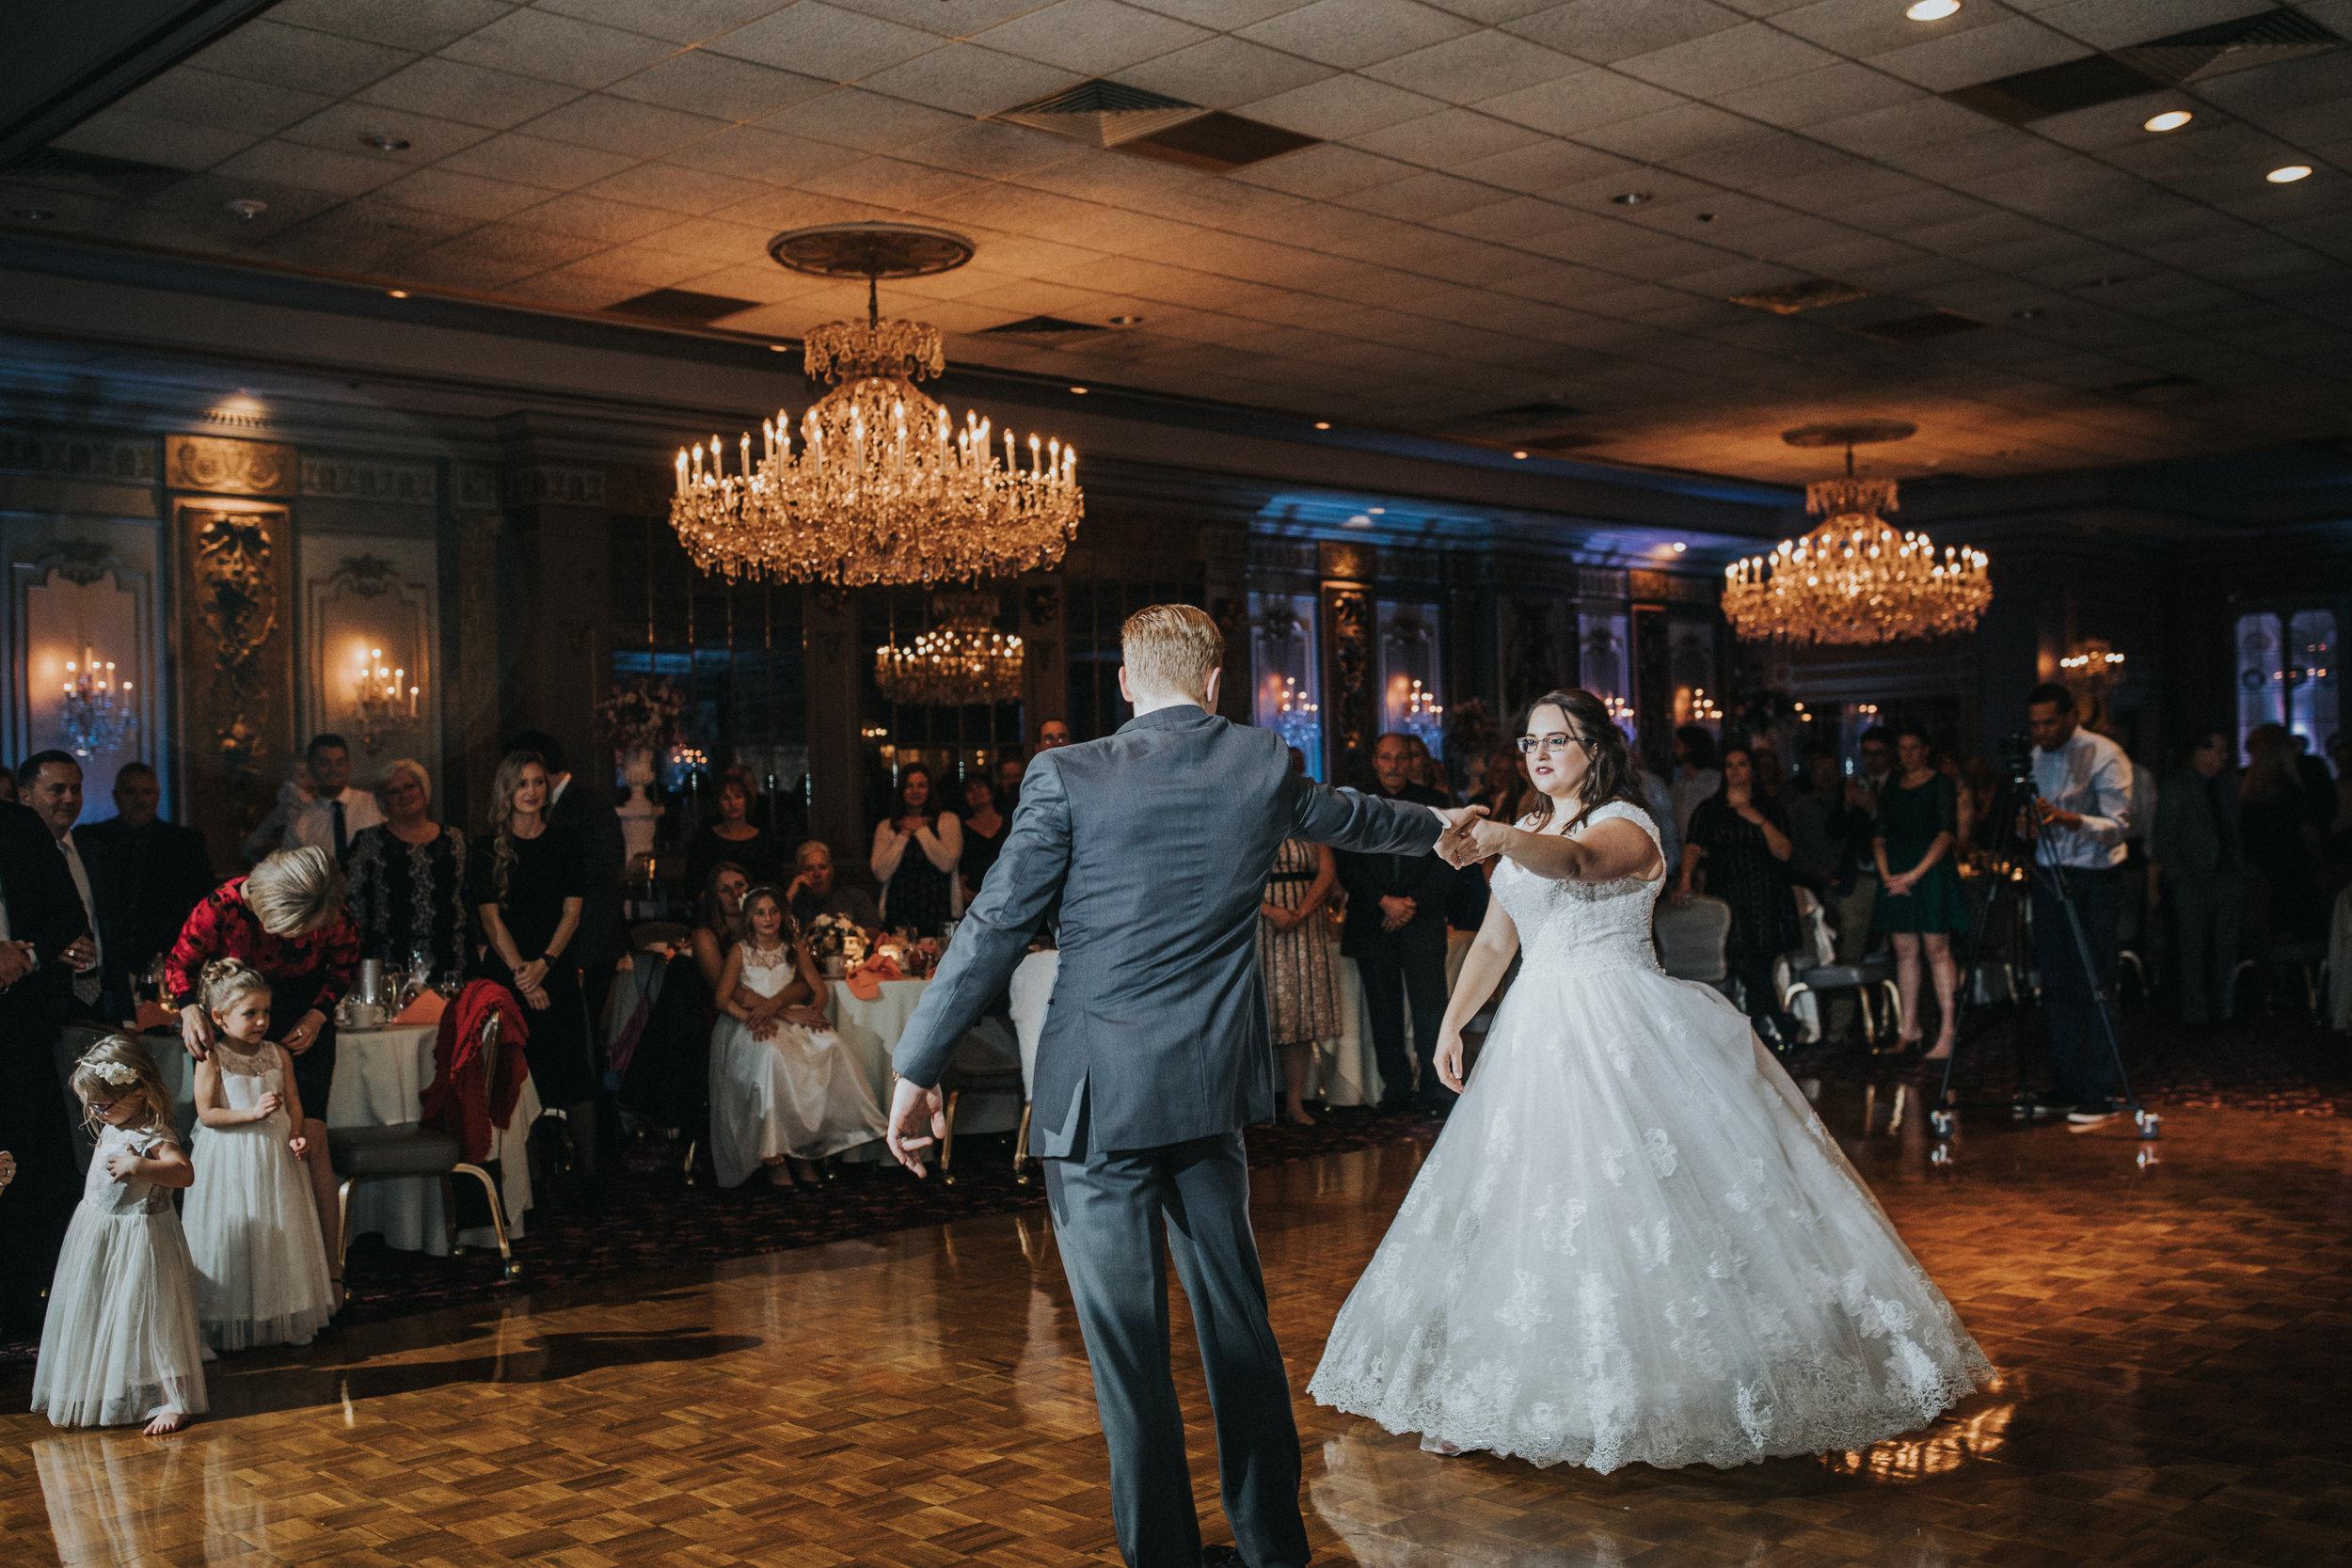 New-Jersey-Wedding-Photography-Fishers-Tudor-House-JennaLynnPhotography-Reception-Kathleen&Eddie-15.jpg